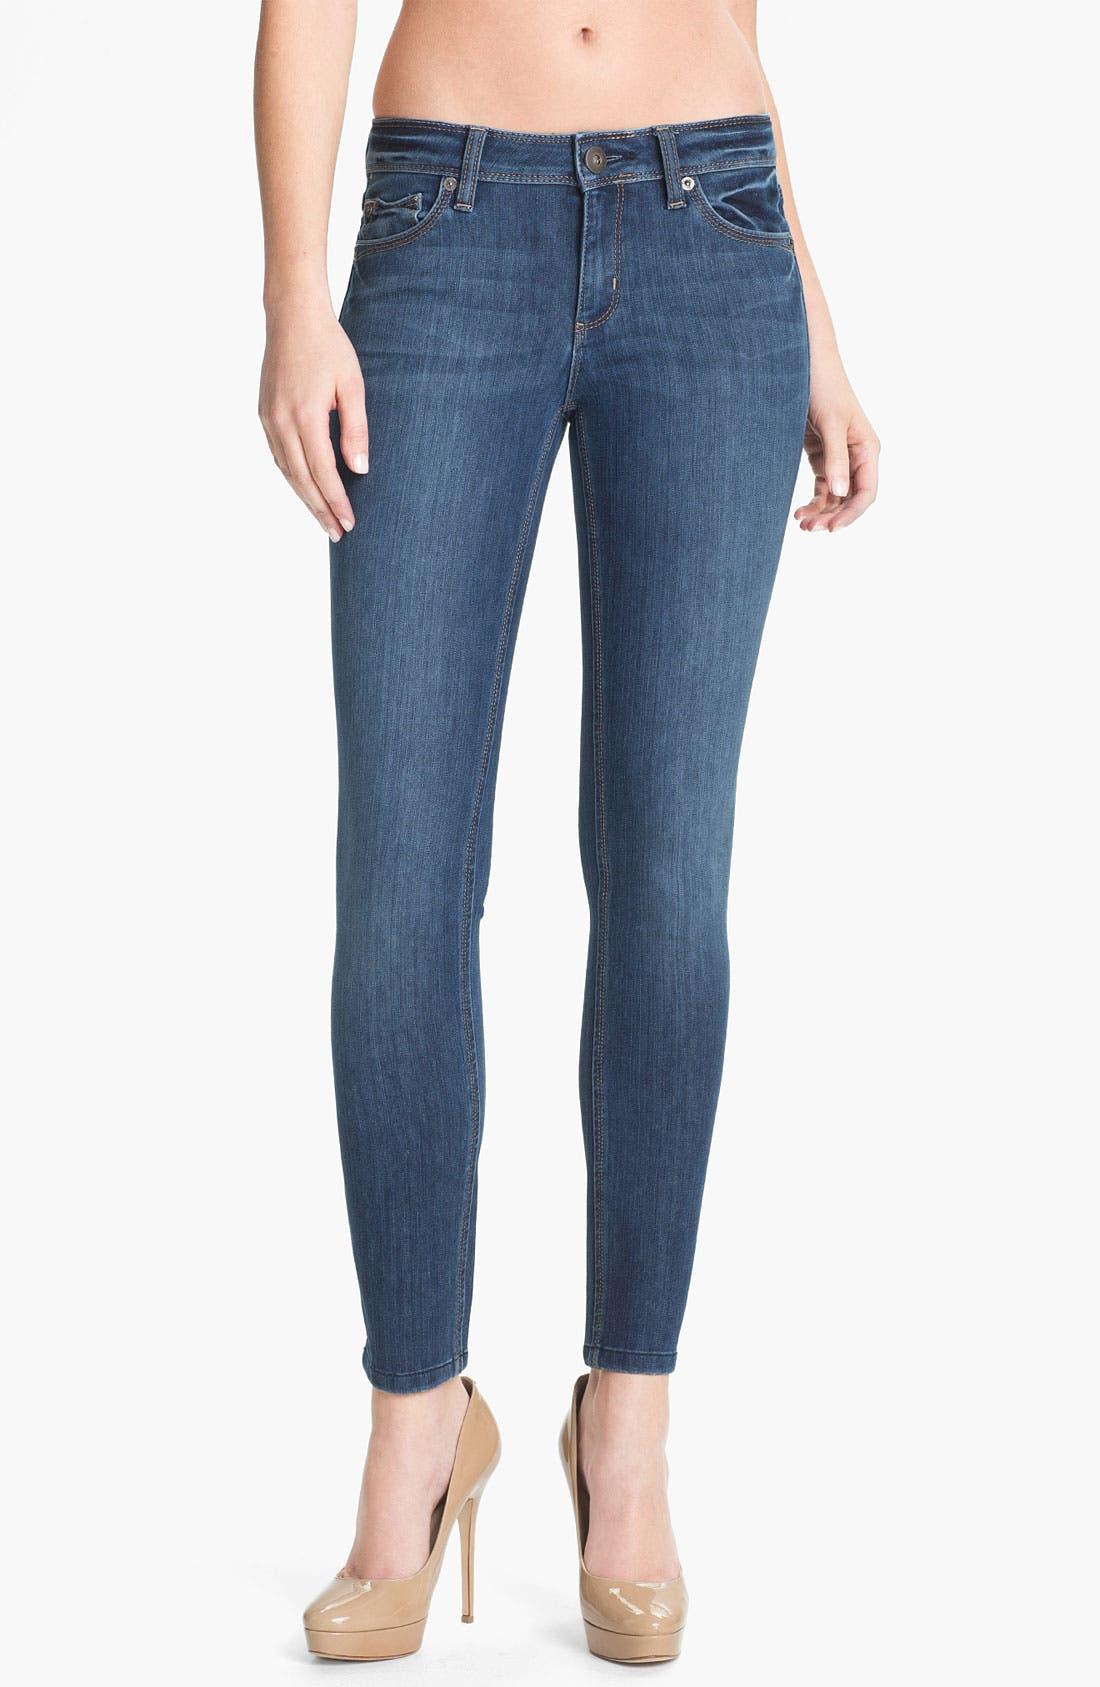 Alternate Image 1 Selected - DL1961 'Angel' X-Fit Stretch Denim Skinny Ankle Jeans (Zeppelin)